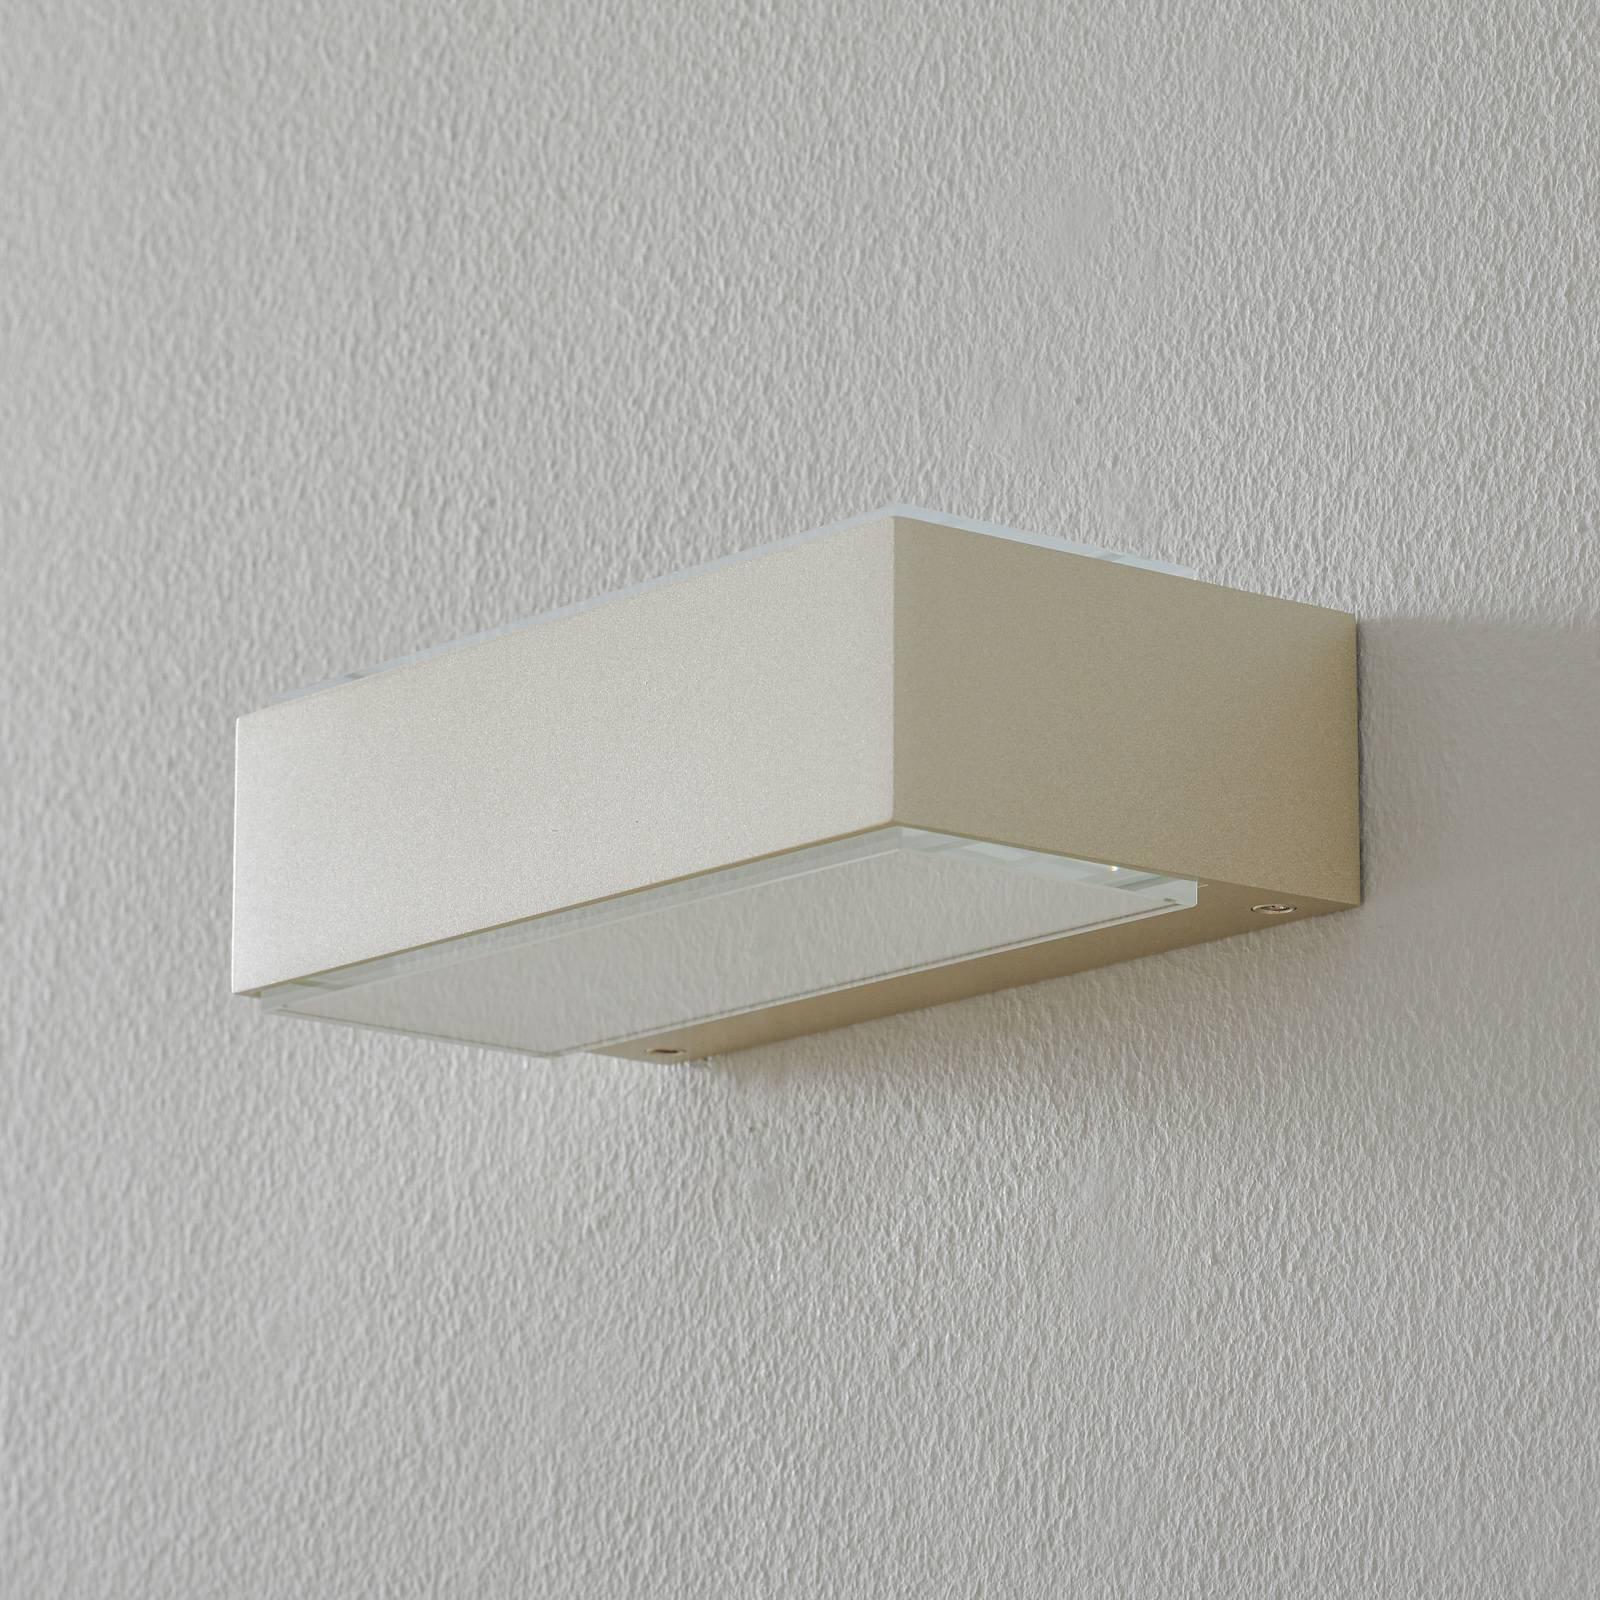 BEGA 12277 LED-vegglampe 3 000 K 20 cm palladium